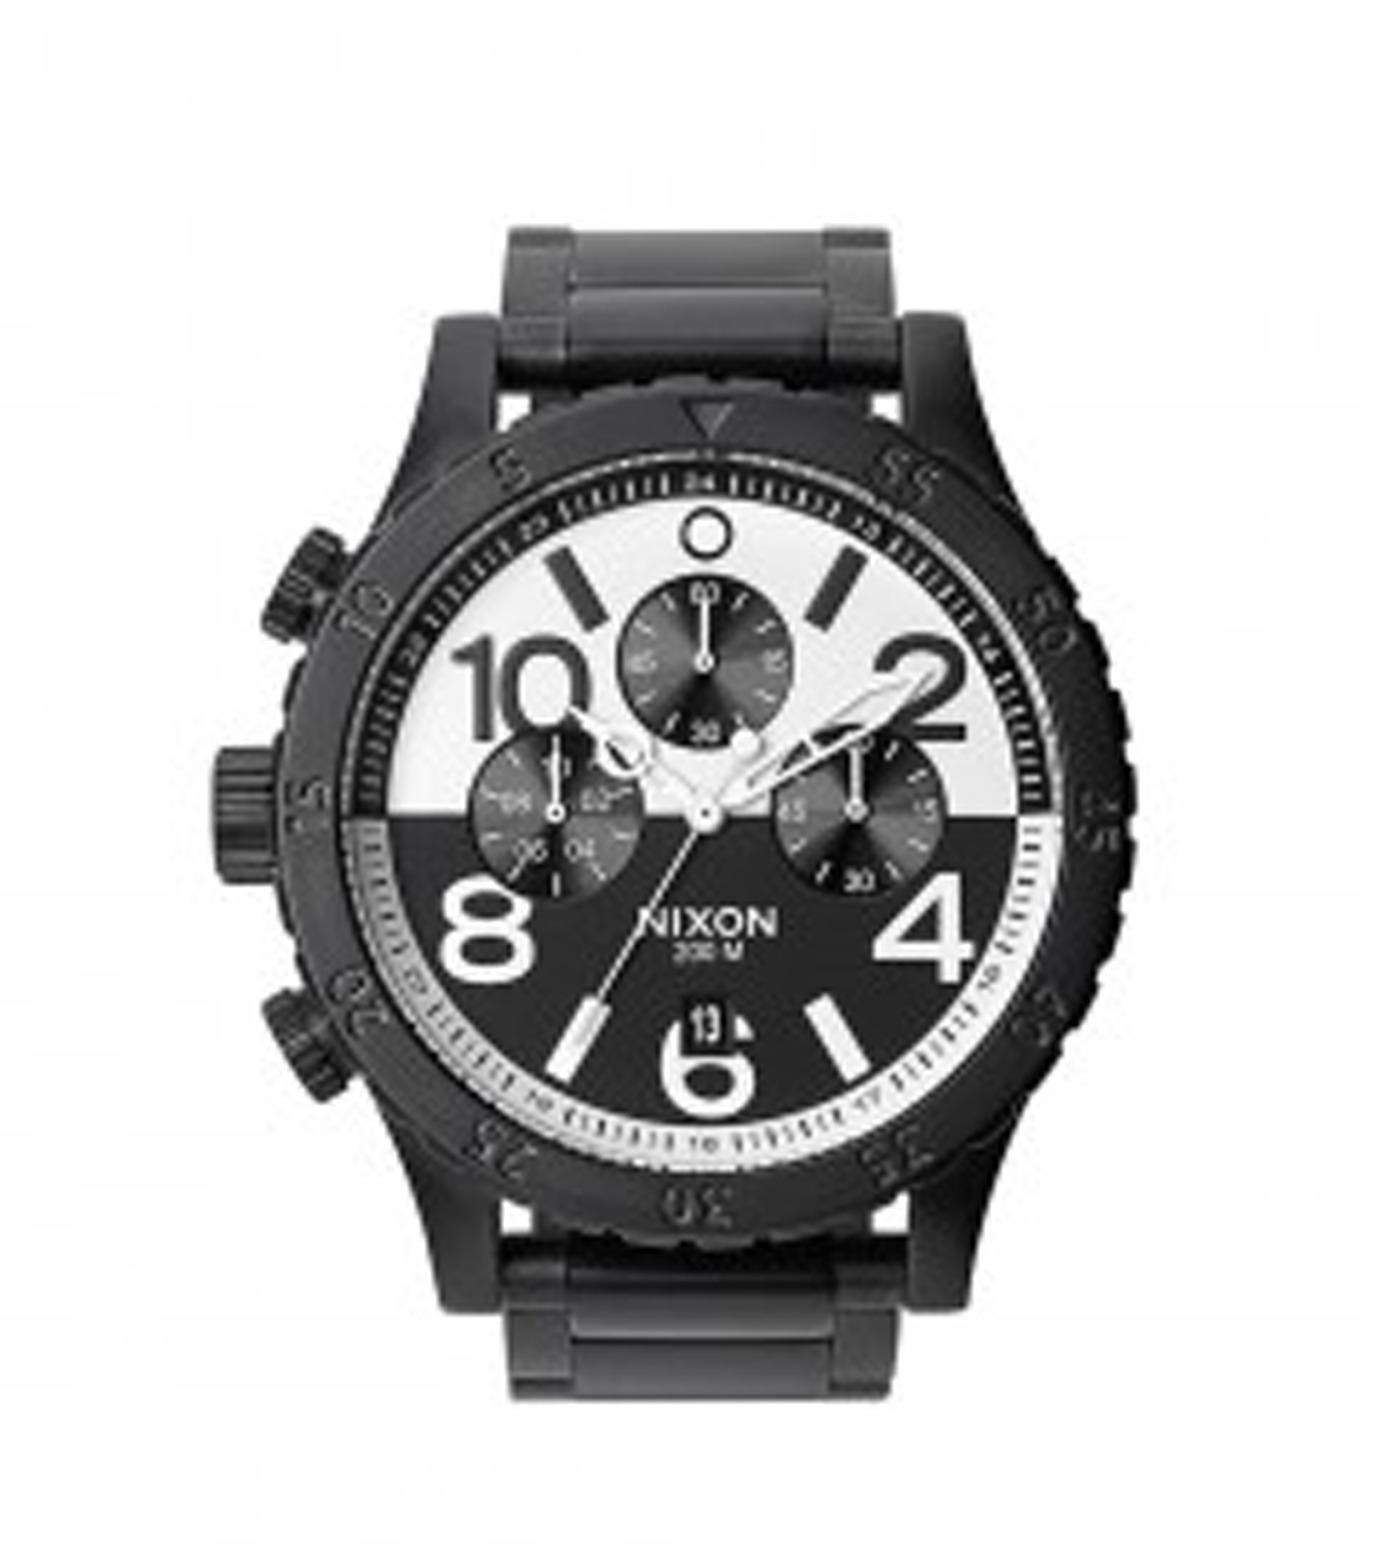 Nixon(ニクソン)の48-20 CHRONO-BLACK(ウォッチ/watch)-A486-13 拡大詳細画像1